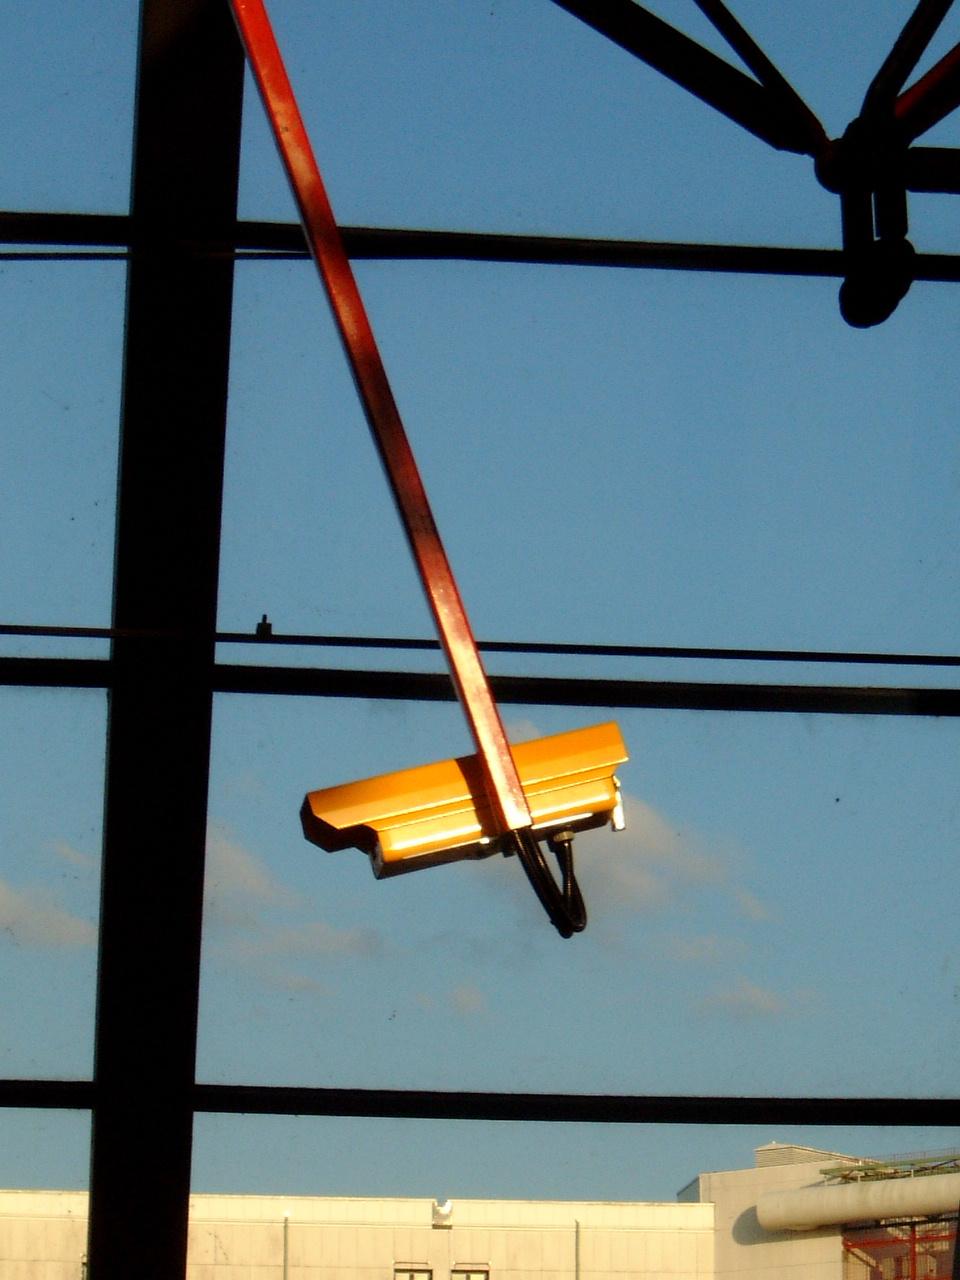 maartent camera observation surveillance big brother